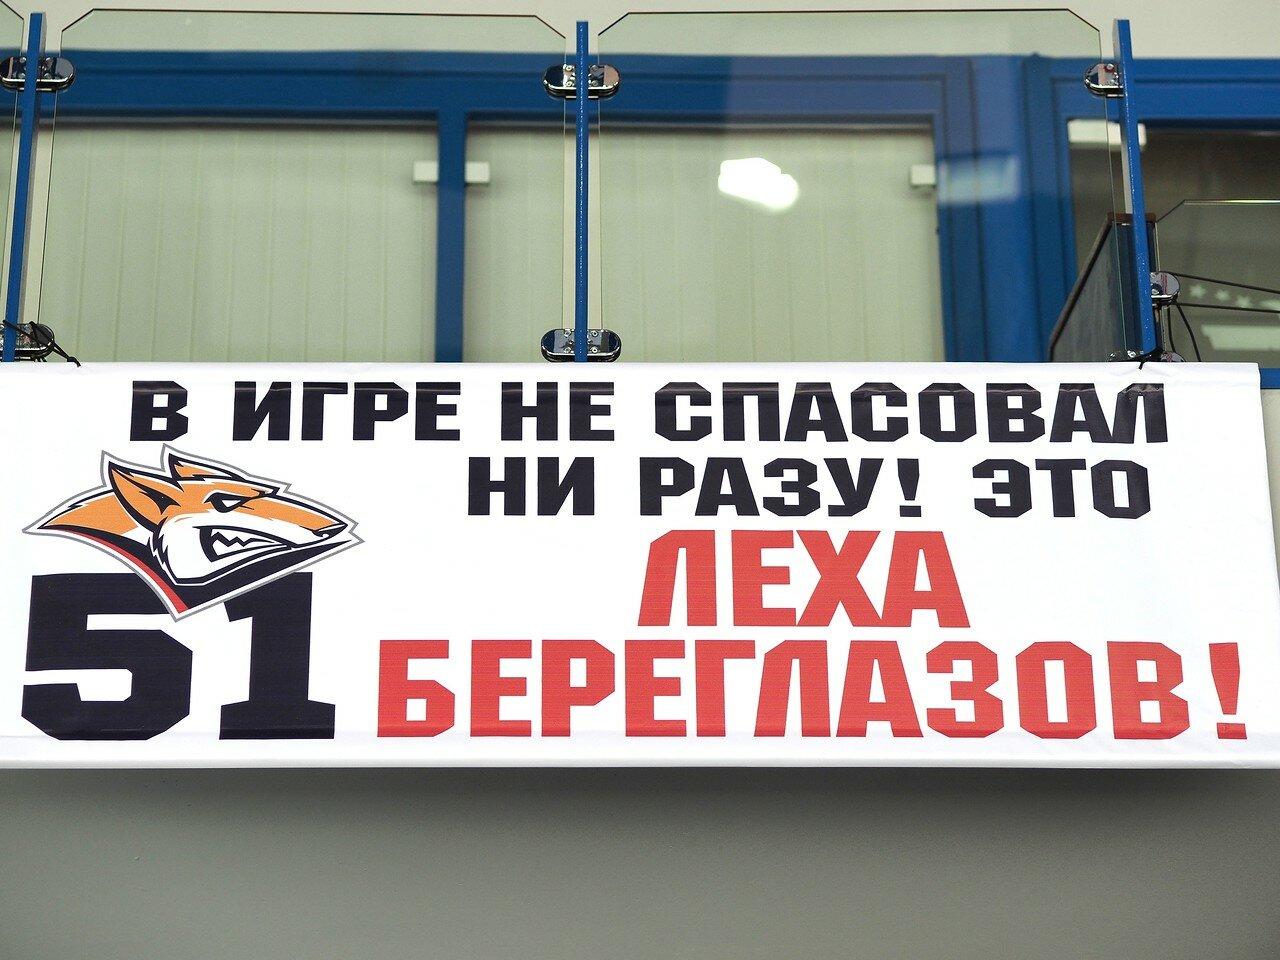 147Восток 1/2 плей-офф Металлург - Сибирь 08.03.2016